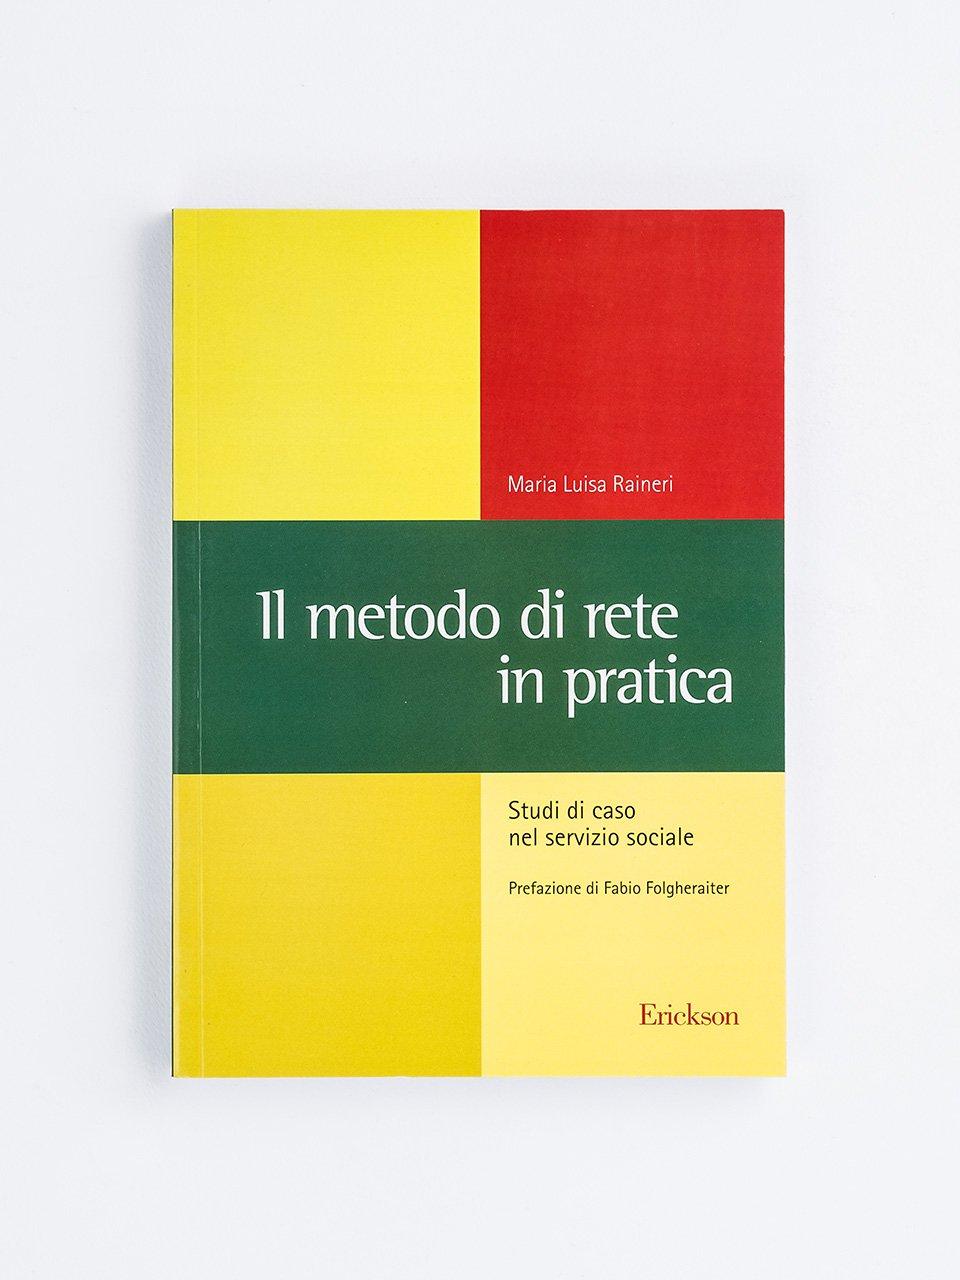 Il metodo di rete in pratica - Metodo del Relational Social Work - Erickson